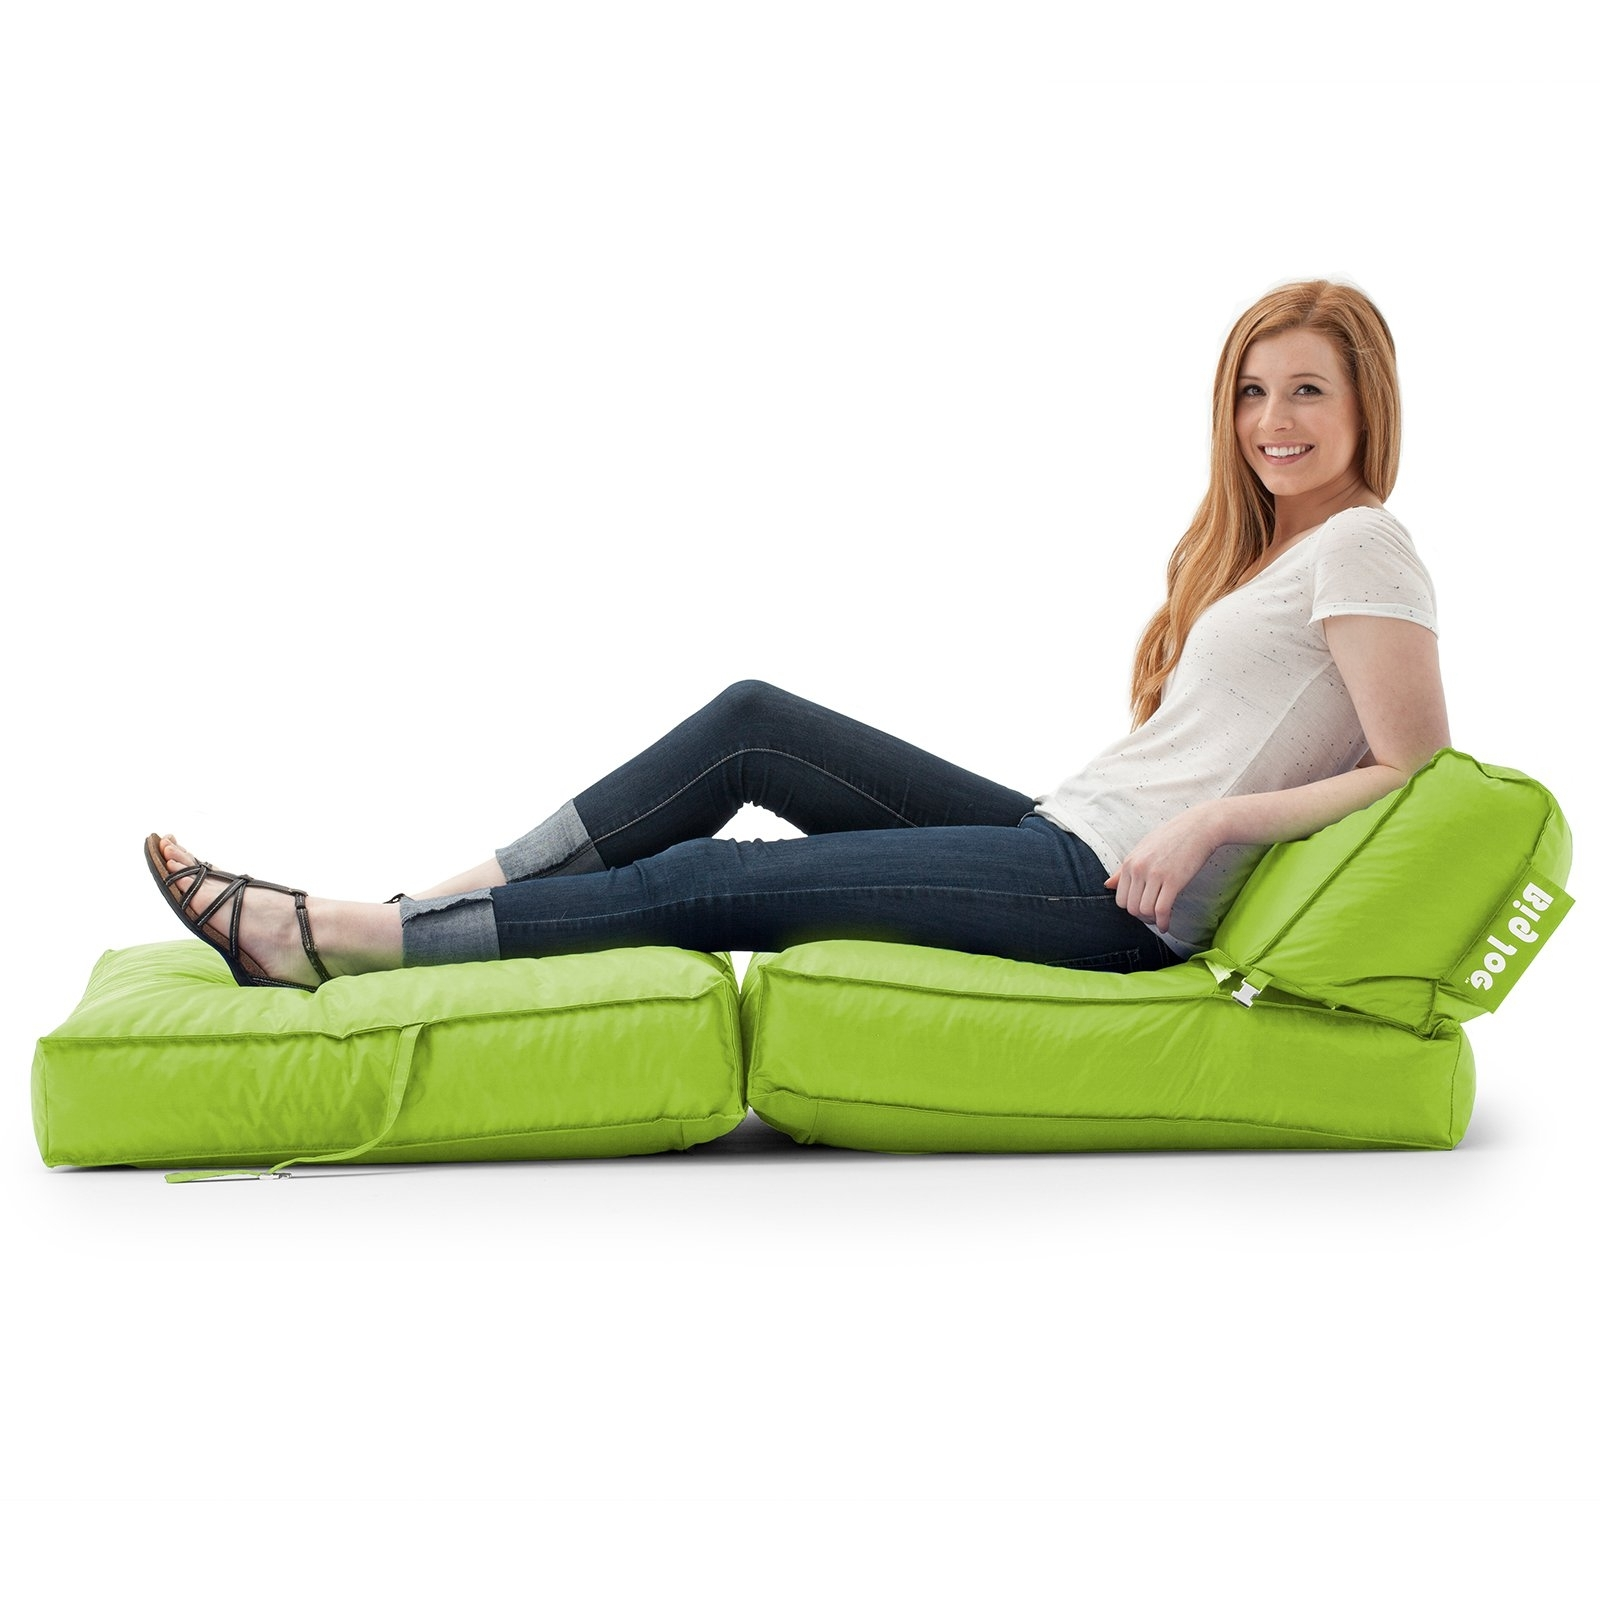 Current Bean Bag Sofas And Chairs For Big Joe Flip Lounger Bean Bag Chair – Walmart (View 9 of 20)